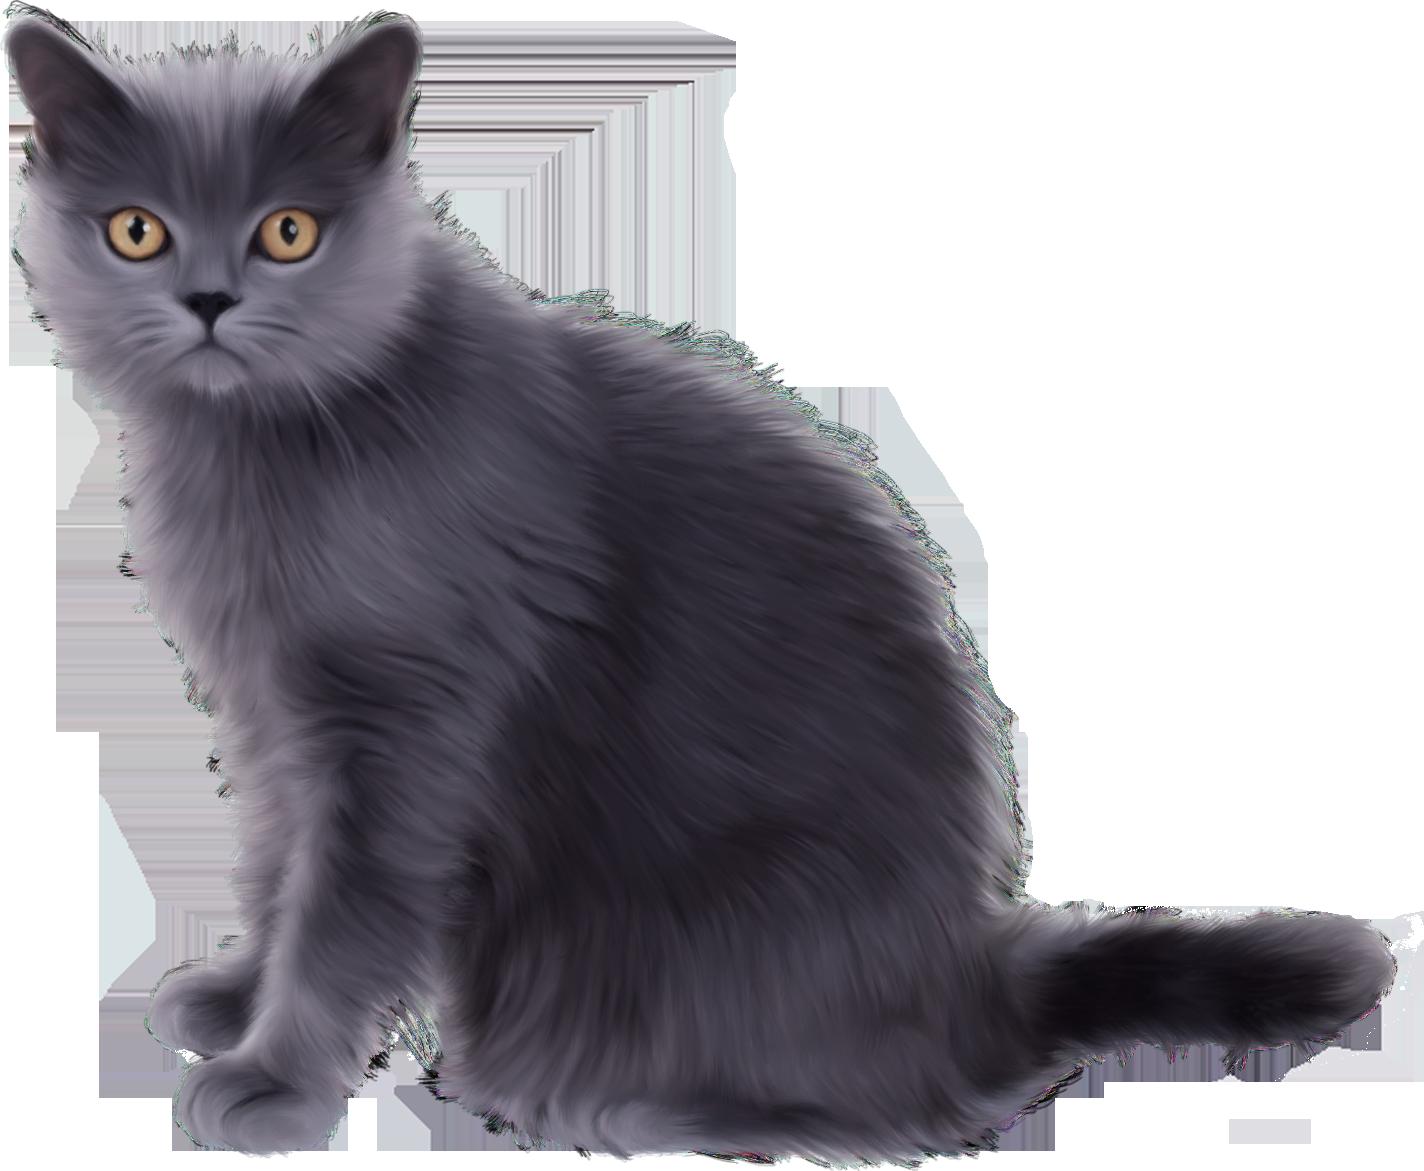 Black Sitting Cat PNG Image